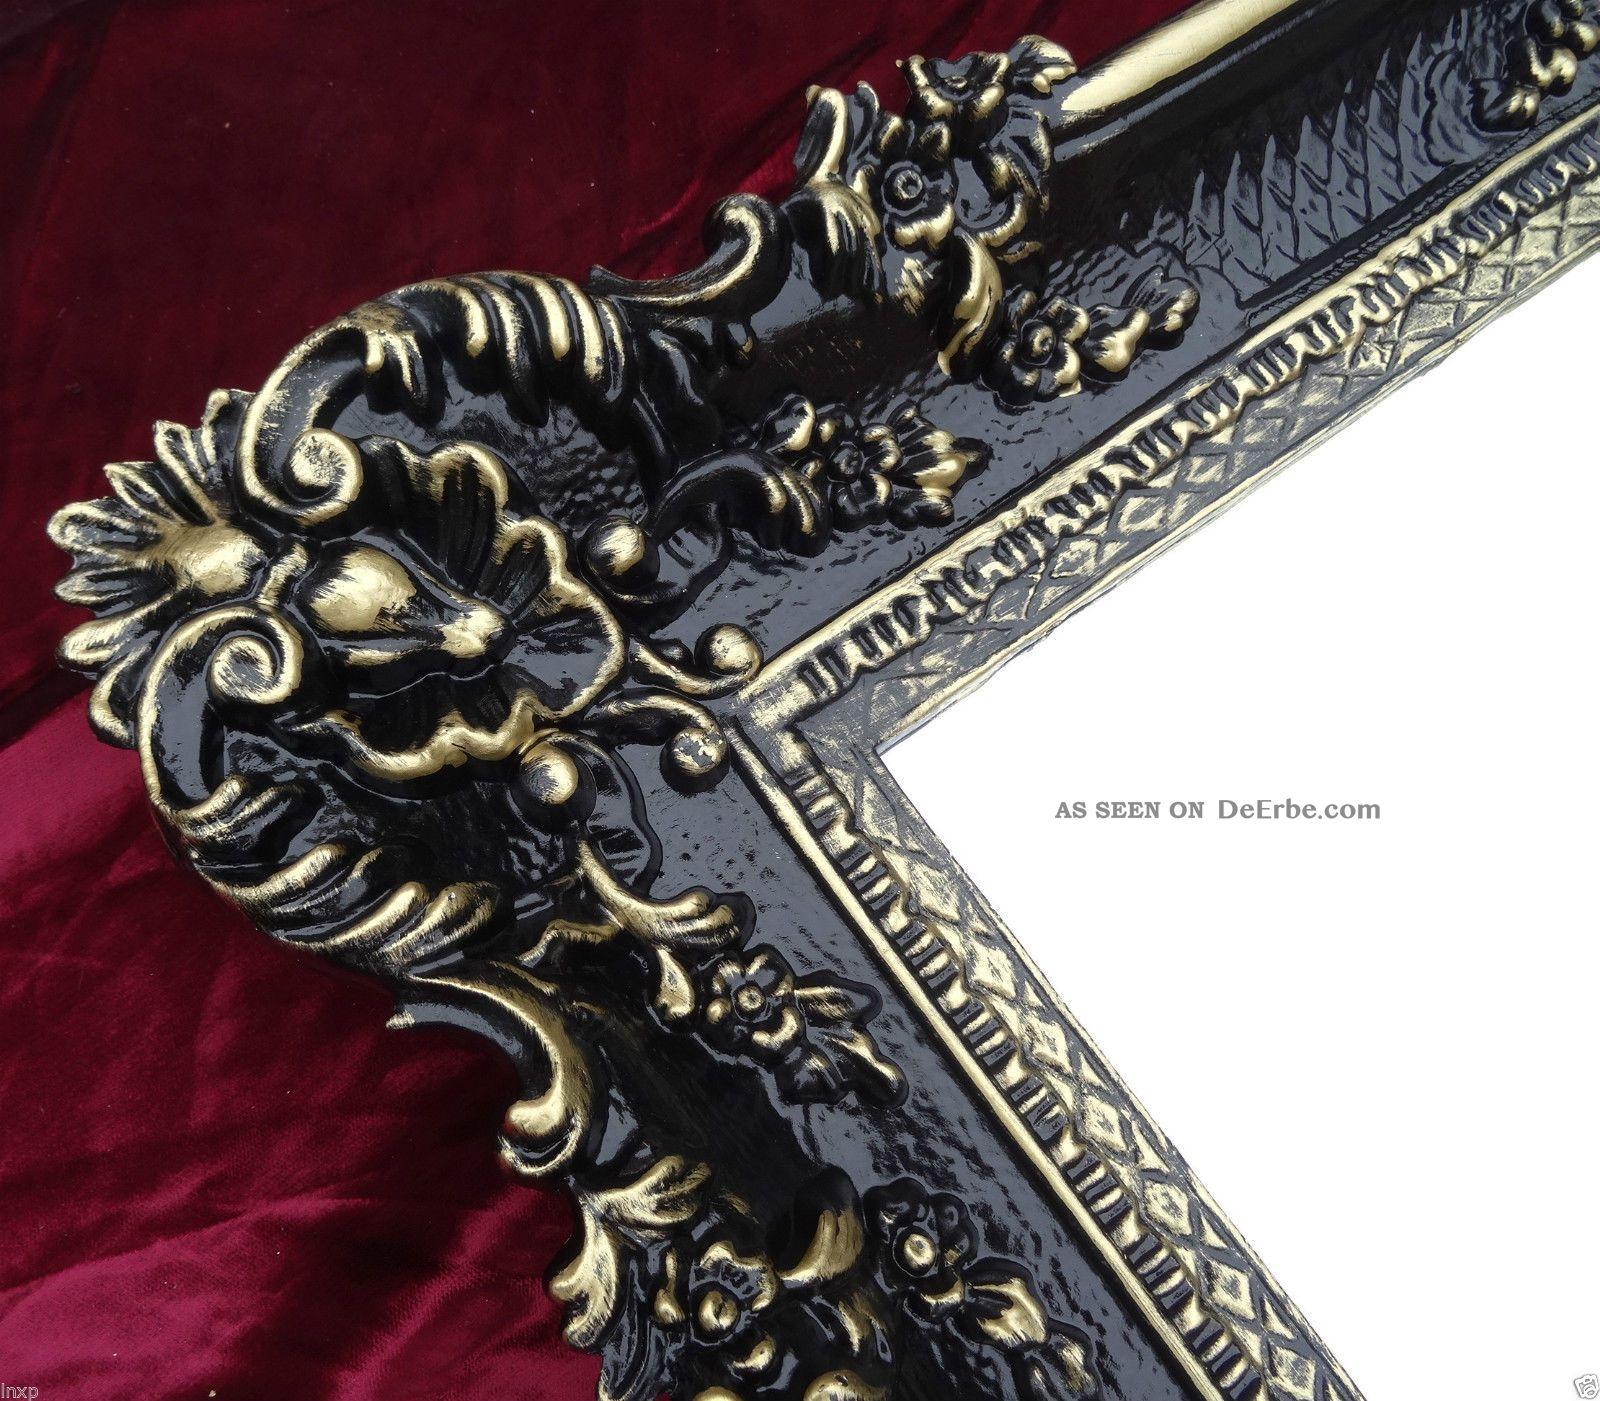 Xxl Wandspiegel Rechteckig Schwarz Gold Barock Wanddeko Antik Spiegel 96x57 Wow Antike Bild